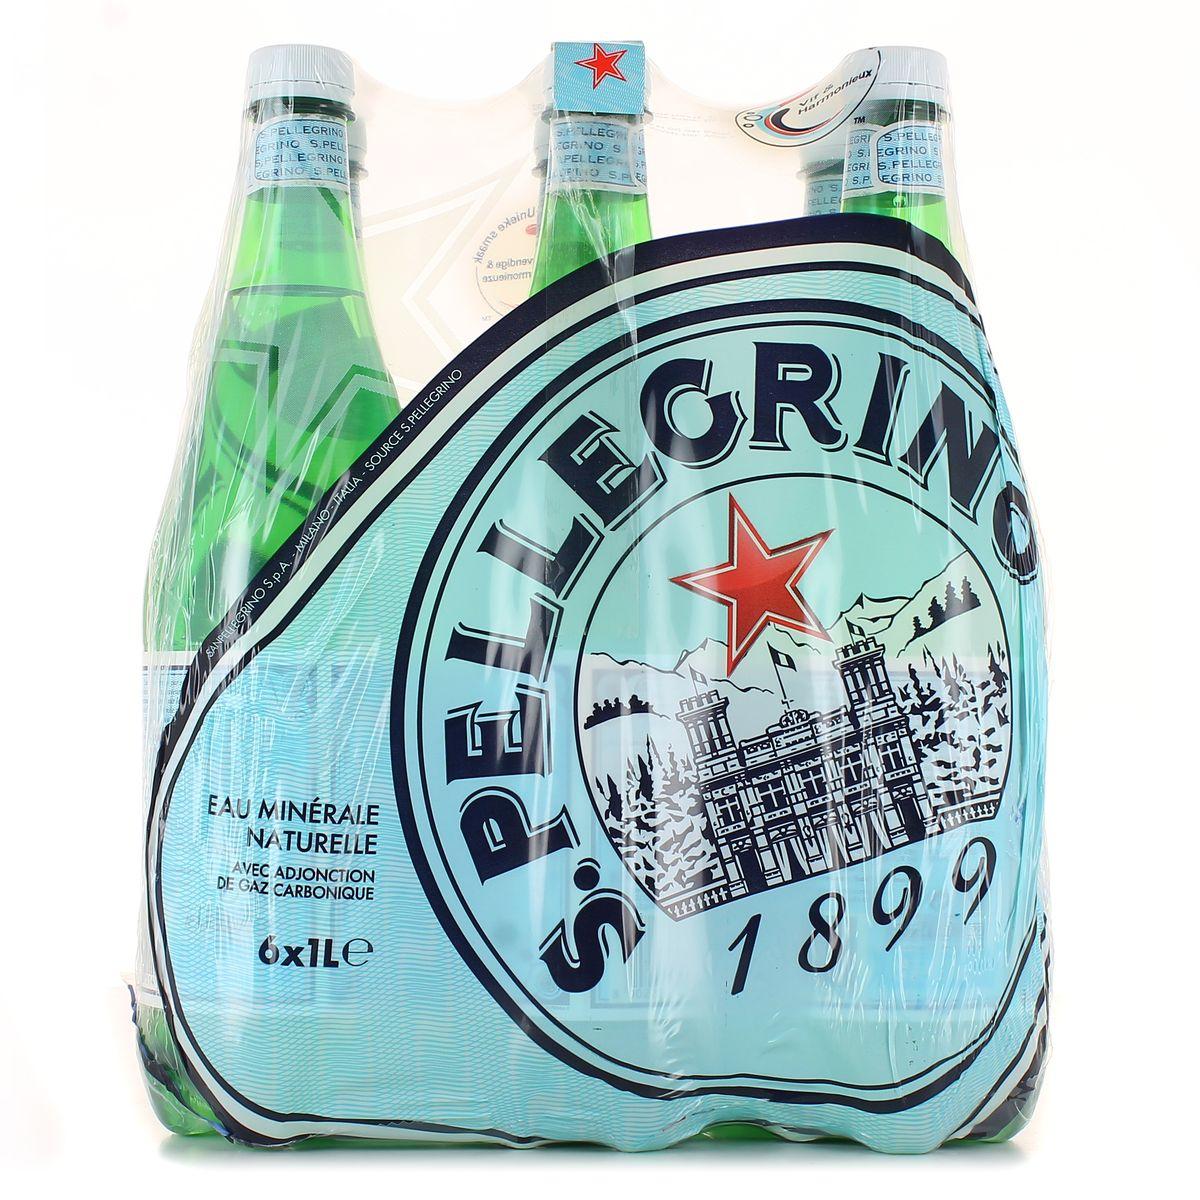 Pack de San Pellegrino (6 x 1 L)